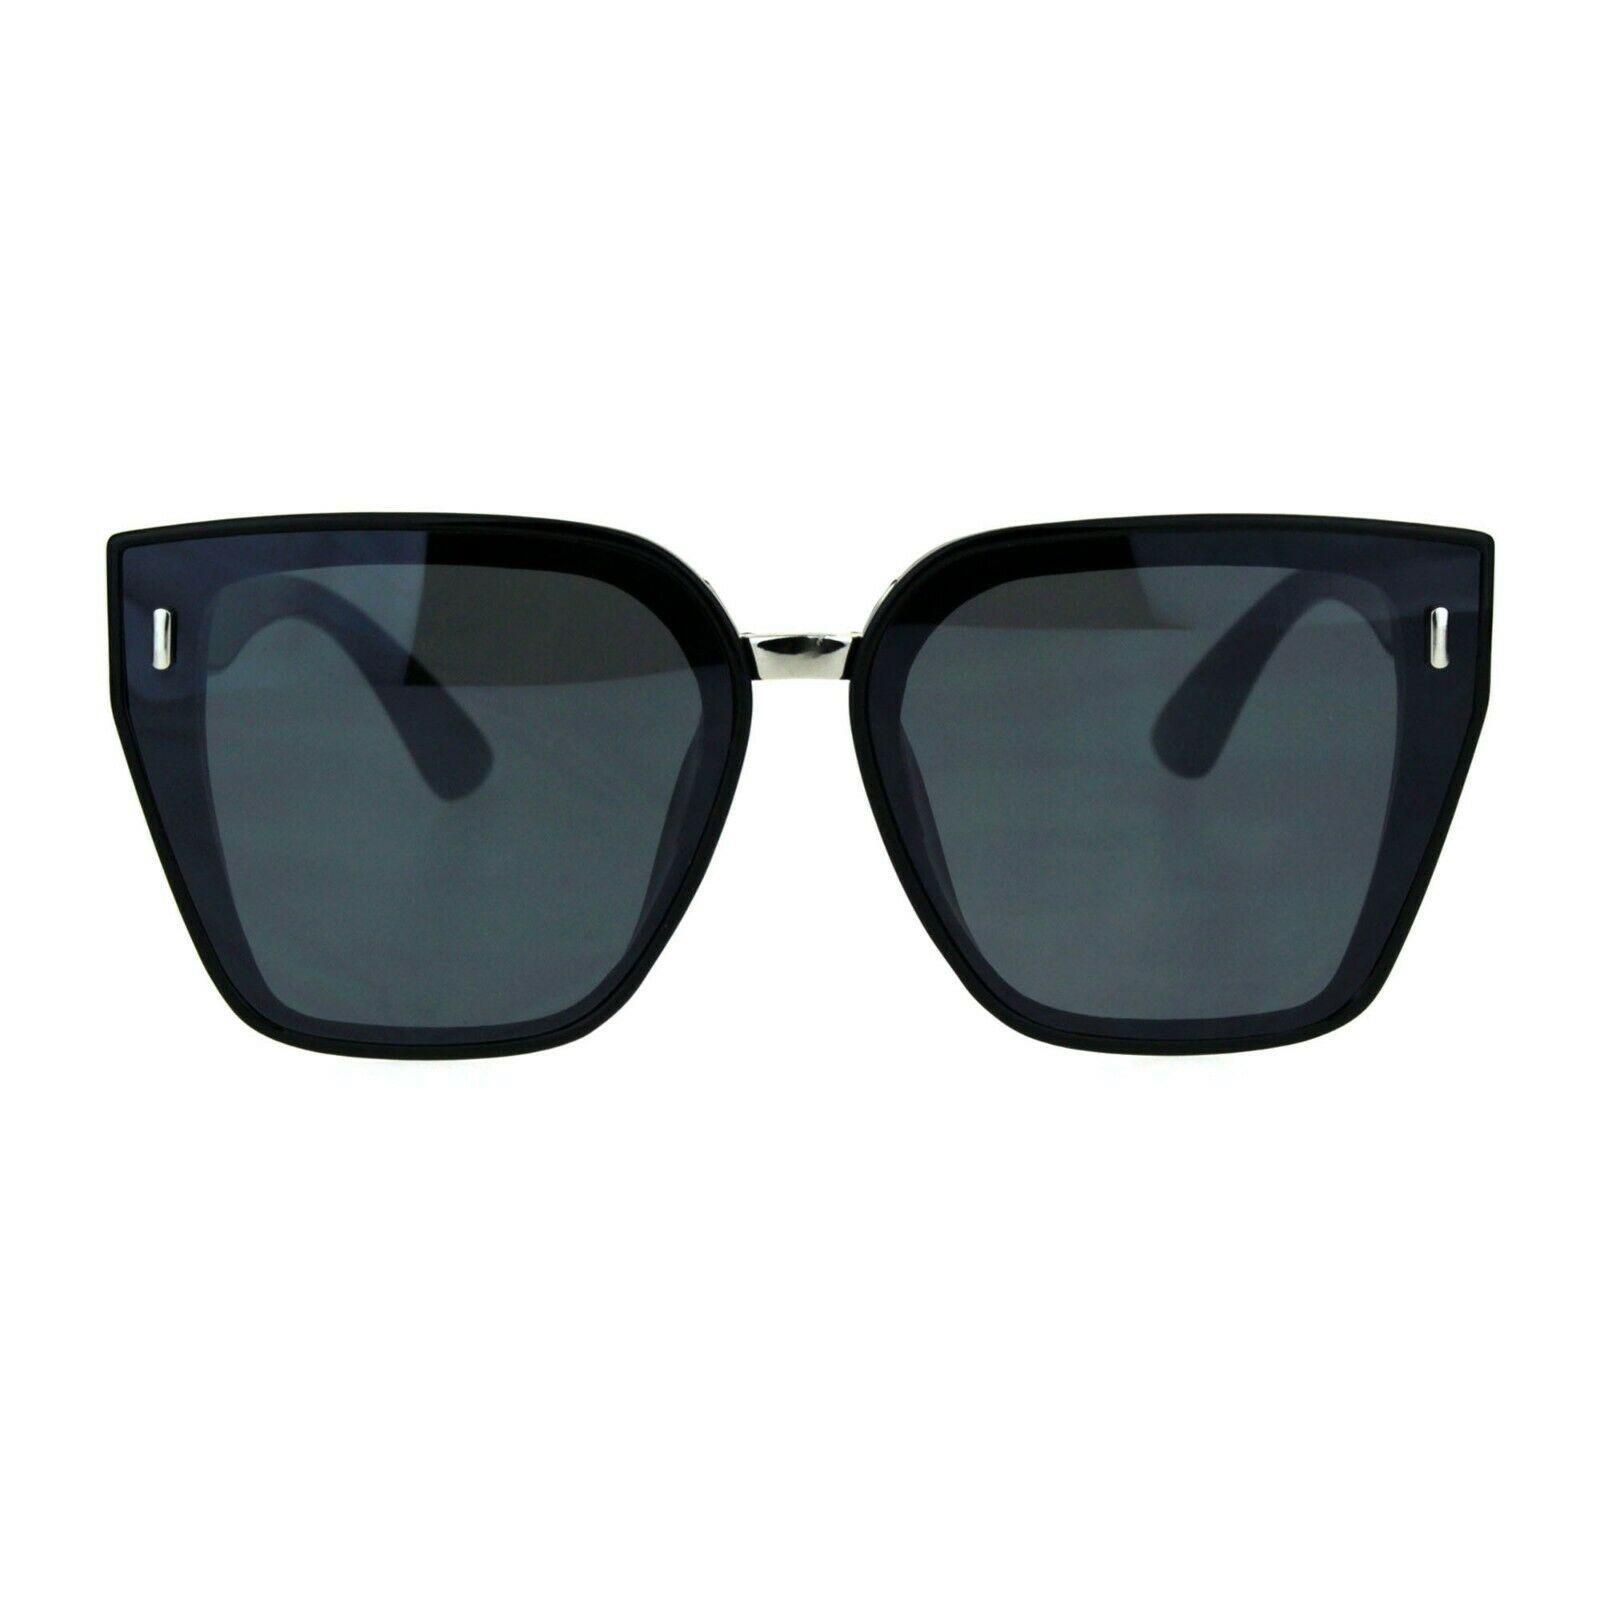 Womens Designer Style Sunglasses Oversized Trapezoid Frame UV 400